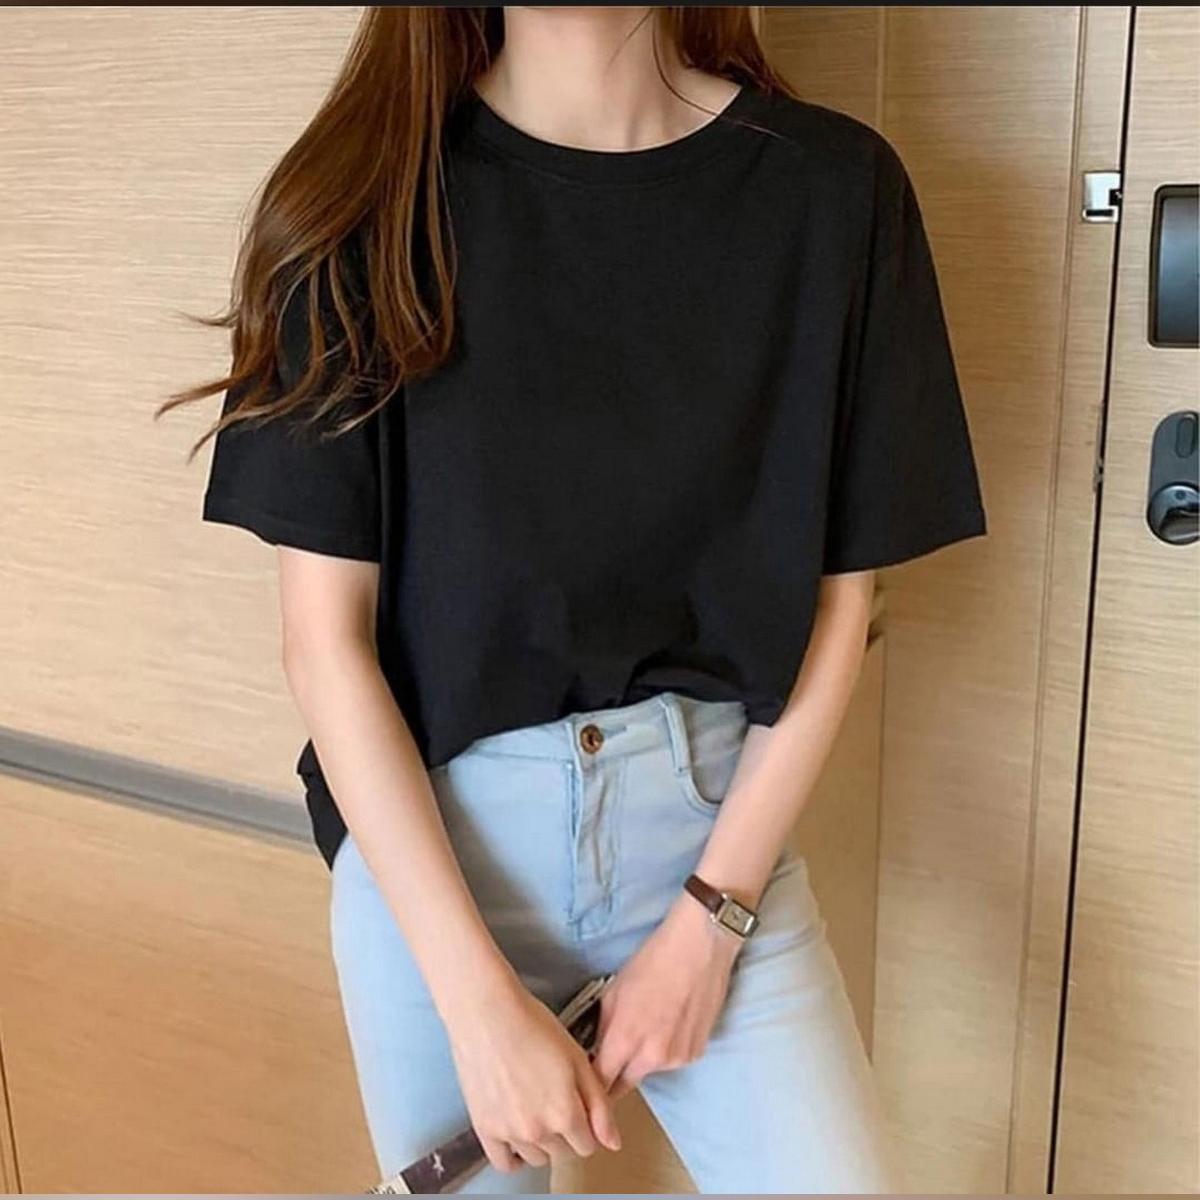 DD Black Round Neck Half Sleeves Plan T Shirt For Girls Women and Ladies